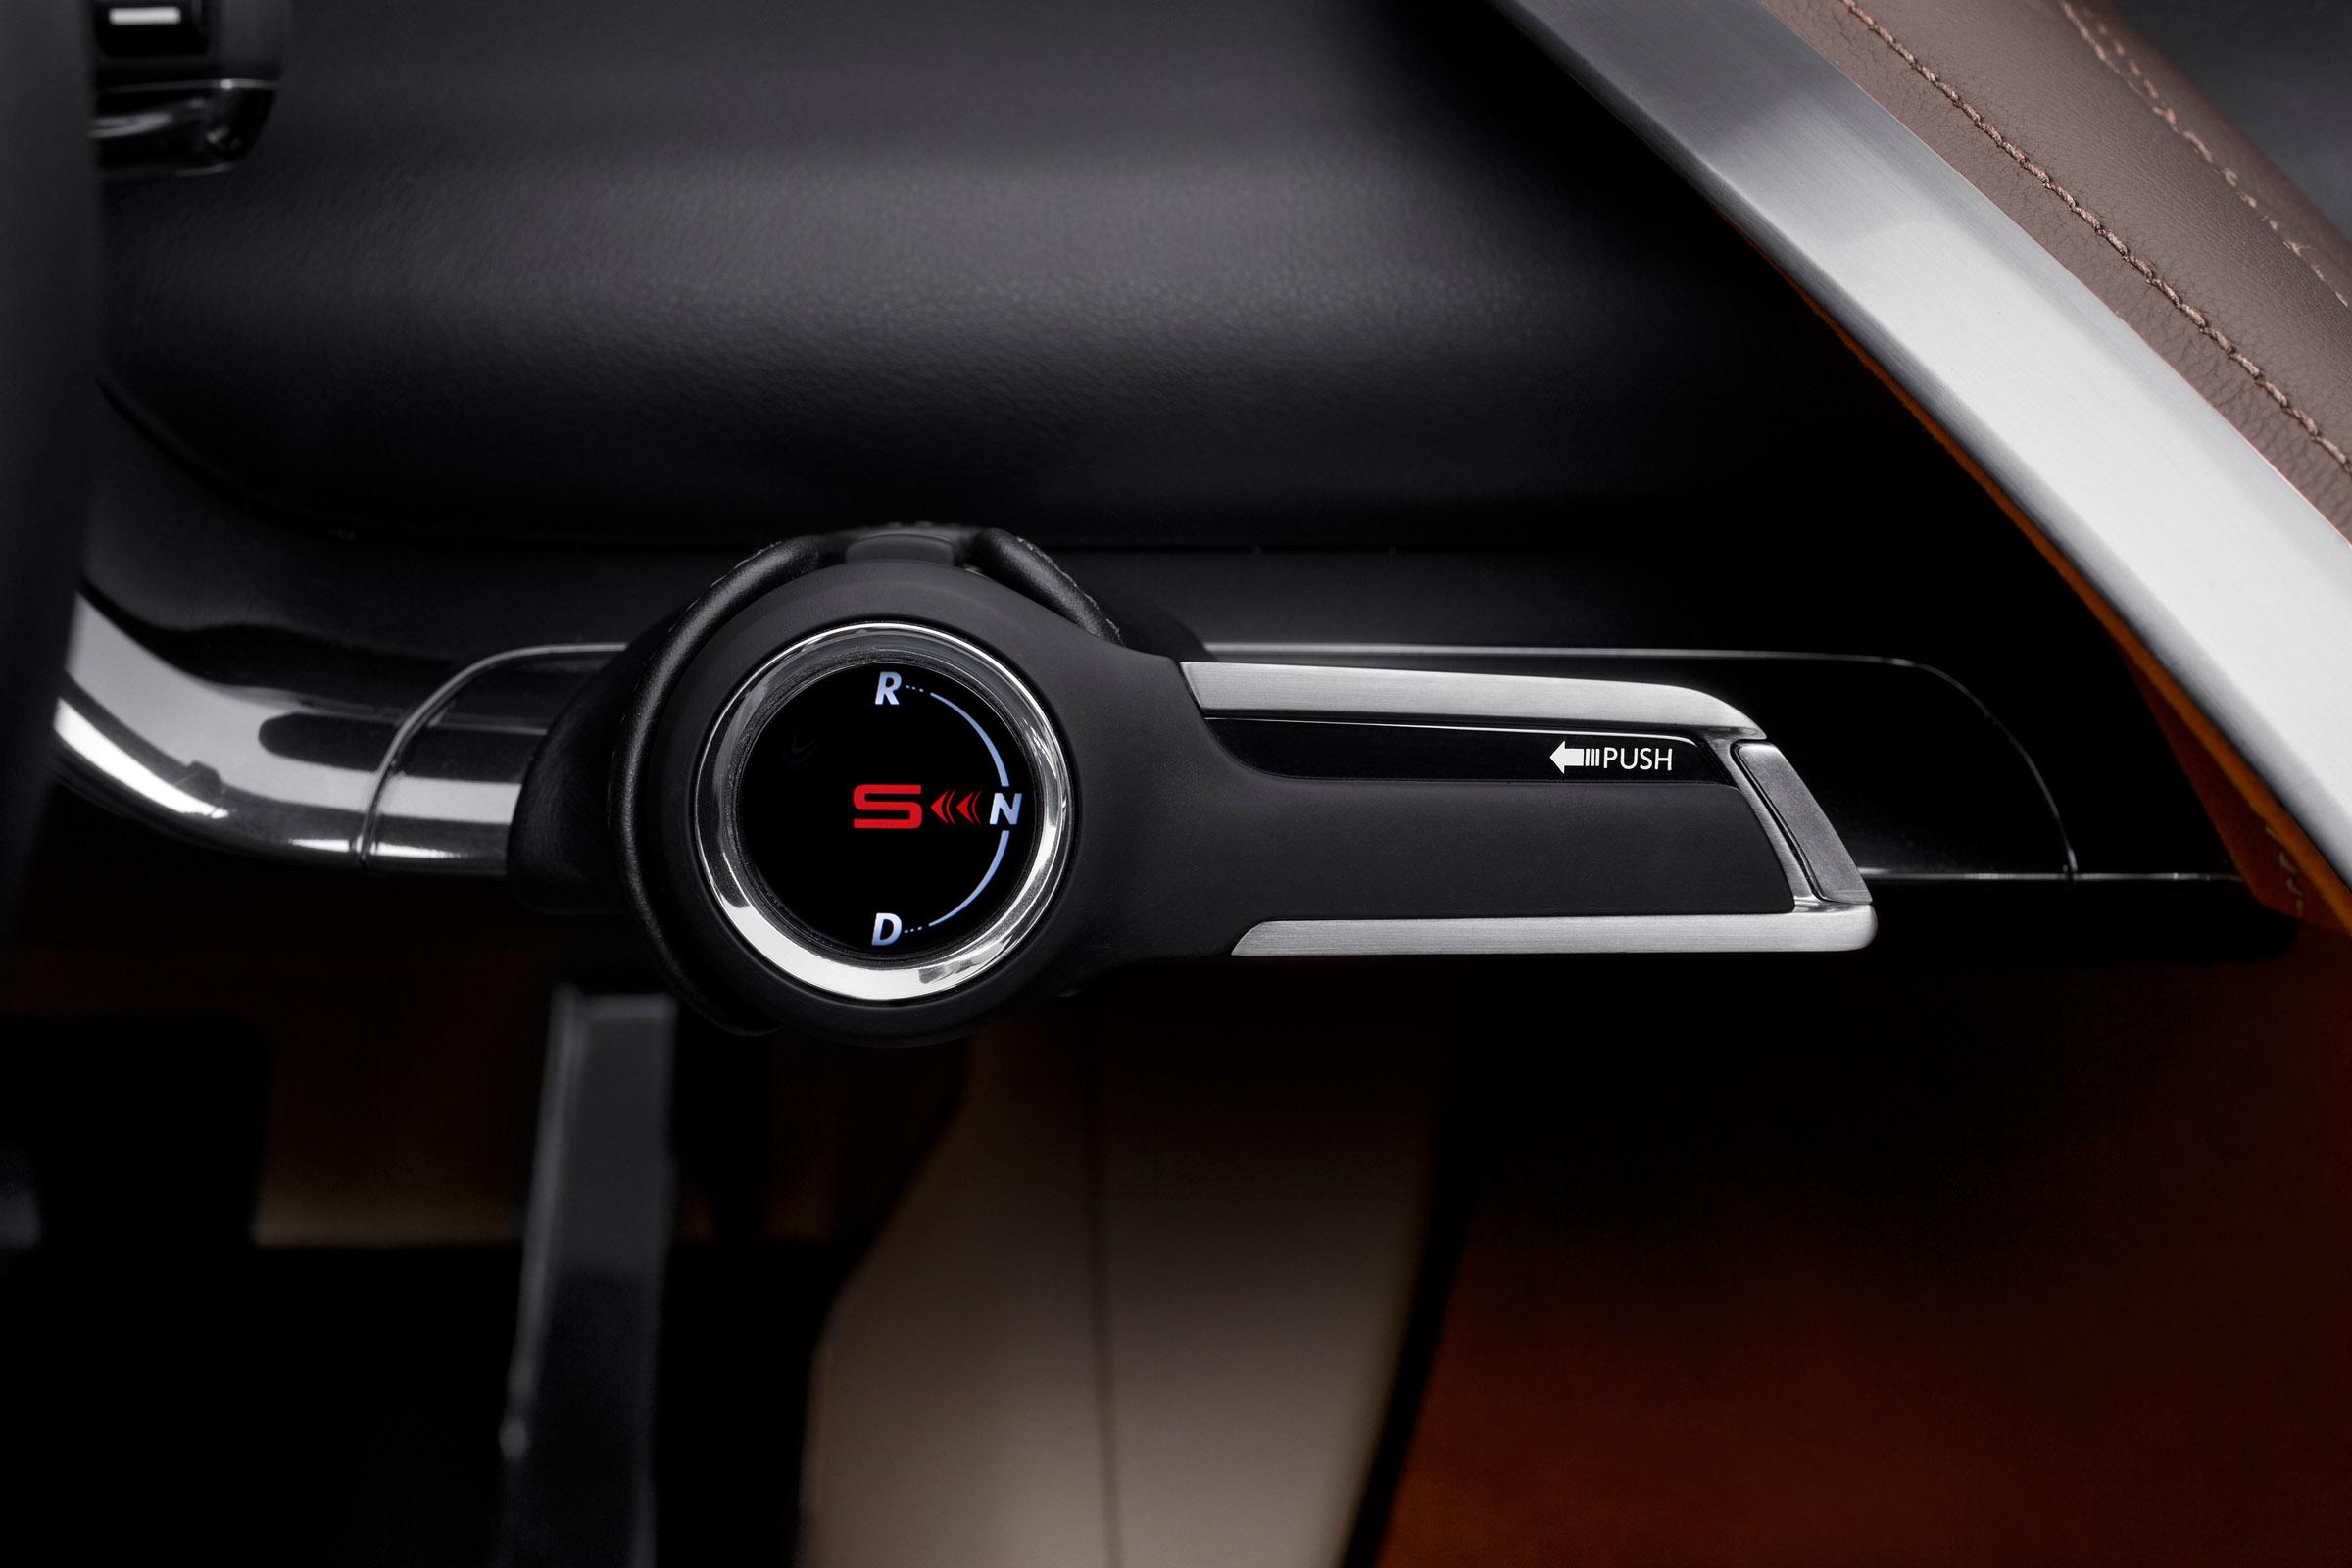 https://www.automobilesreview.com/gallery/2012-lexus-lf-lc-sport-coupe-concept/2012-lexus-lf-lc-sport-coupe-concept-21.jpg